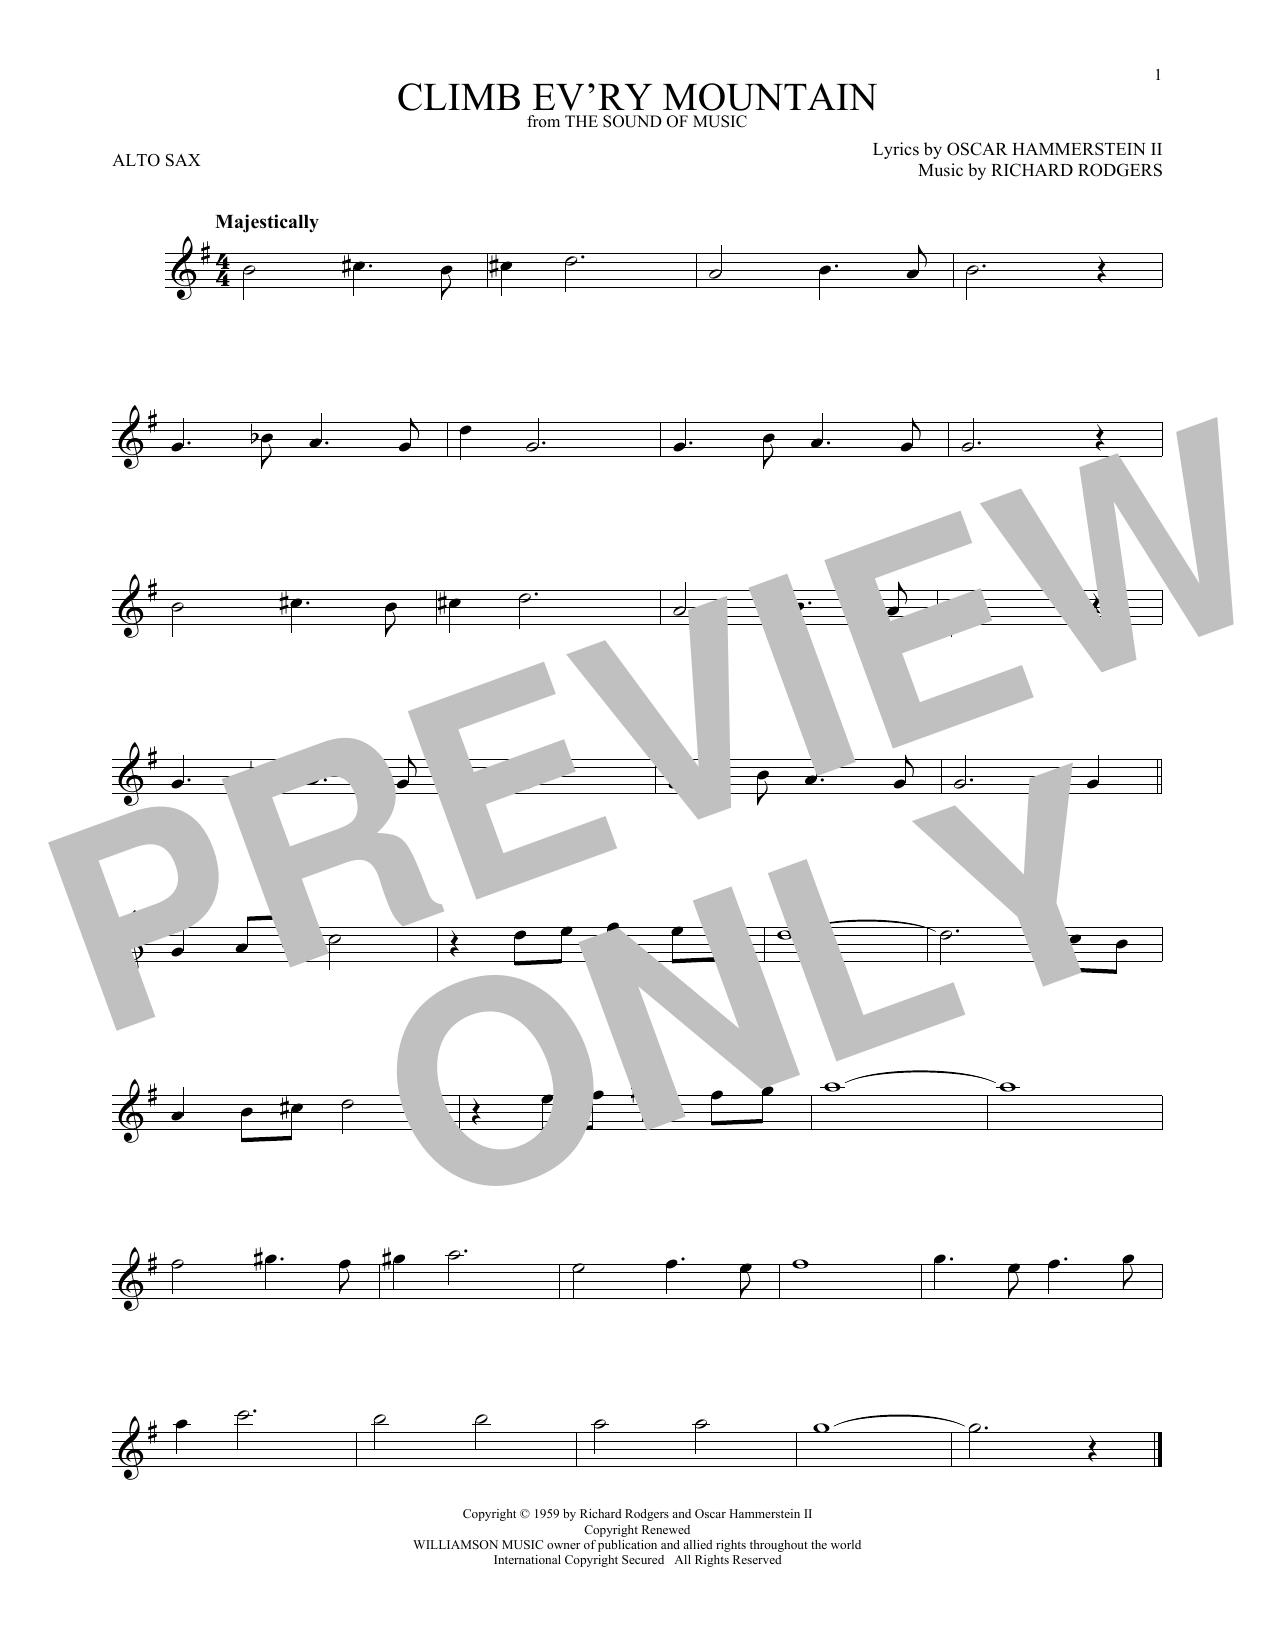 Climb Ev'ry Mountain (from The Sound of Music) (Alto Sax Solo)